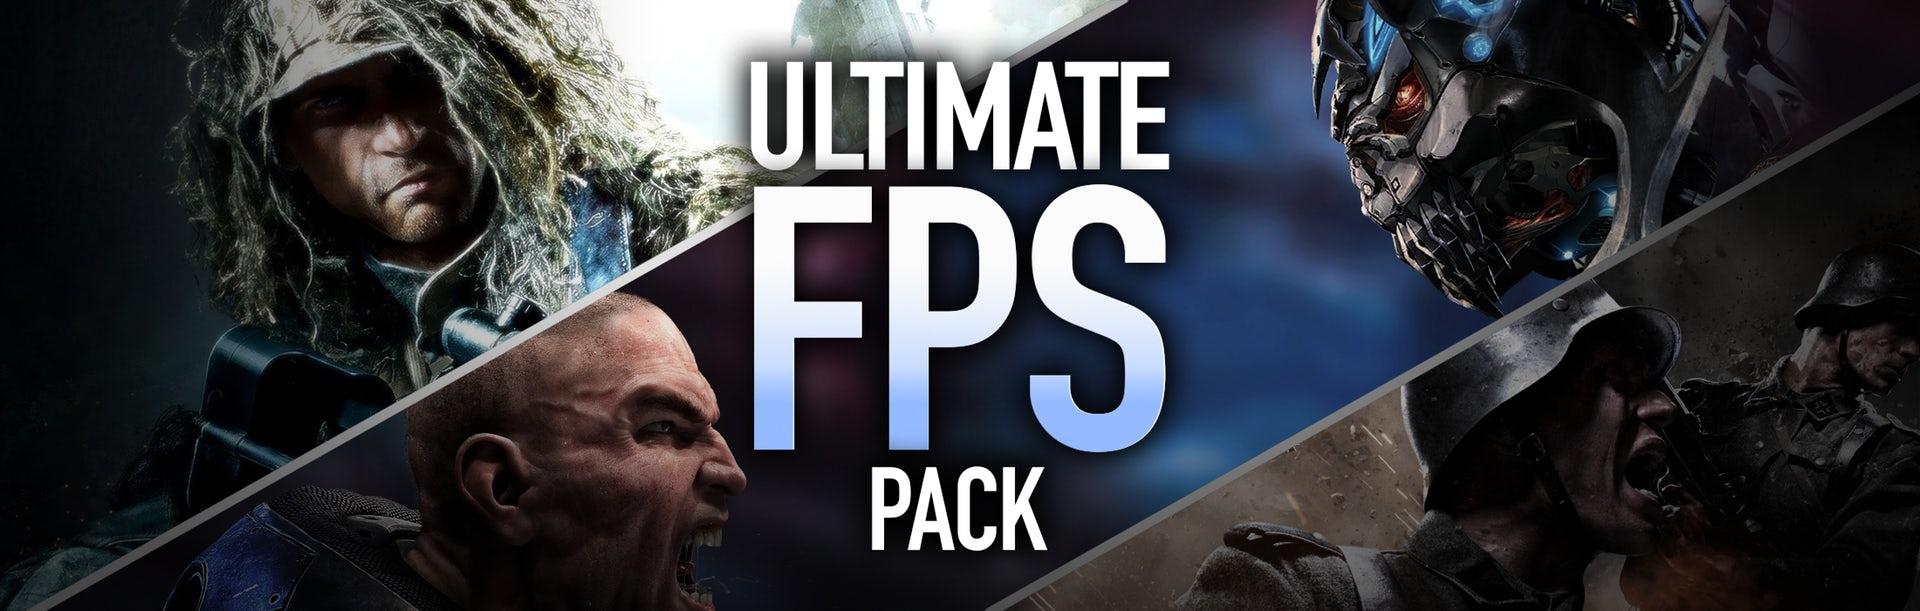 3 pozycje w Ultimate FPS Pack z Fanatical